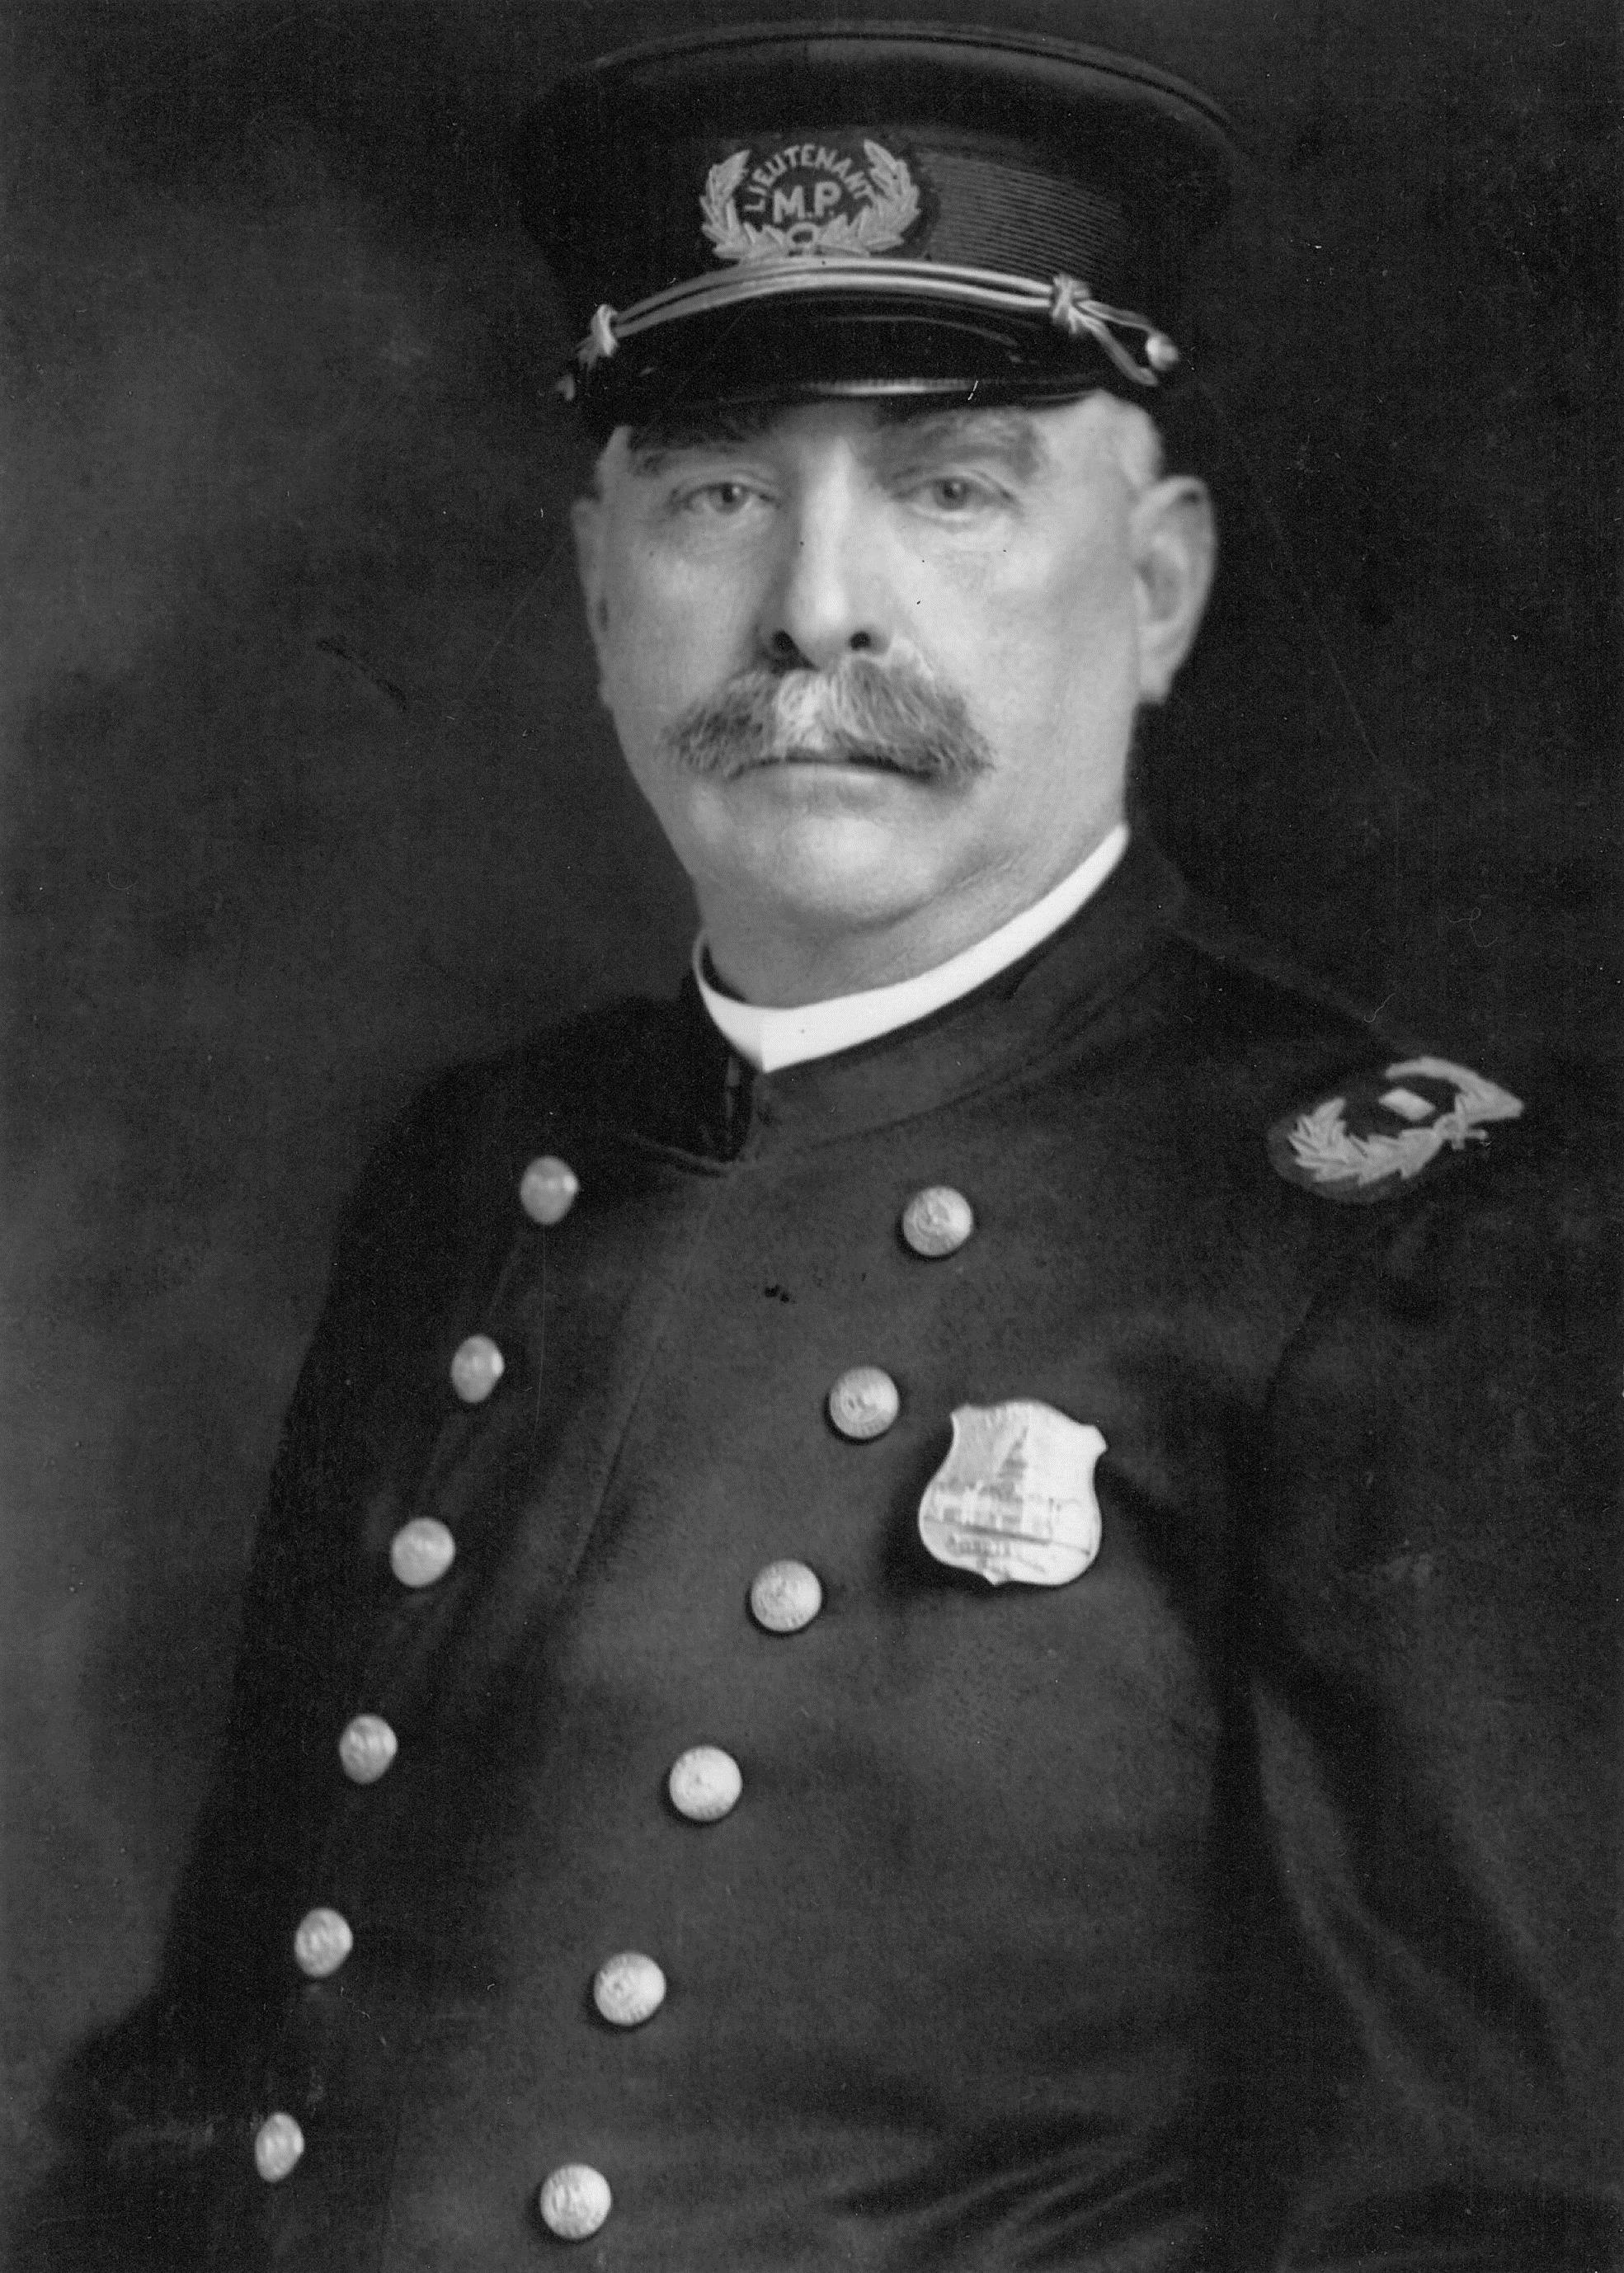 Lieutenant David T. Dunigan | Metropolitan Police Department, District of Columbia